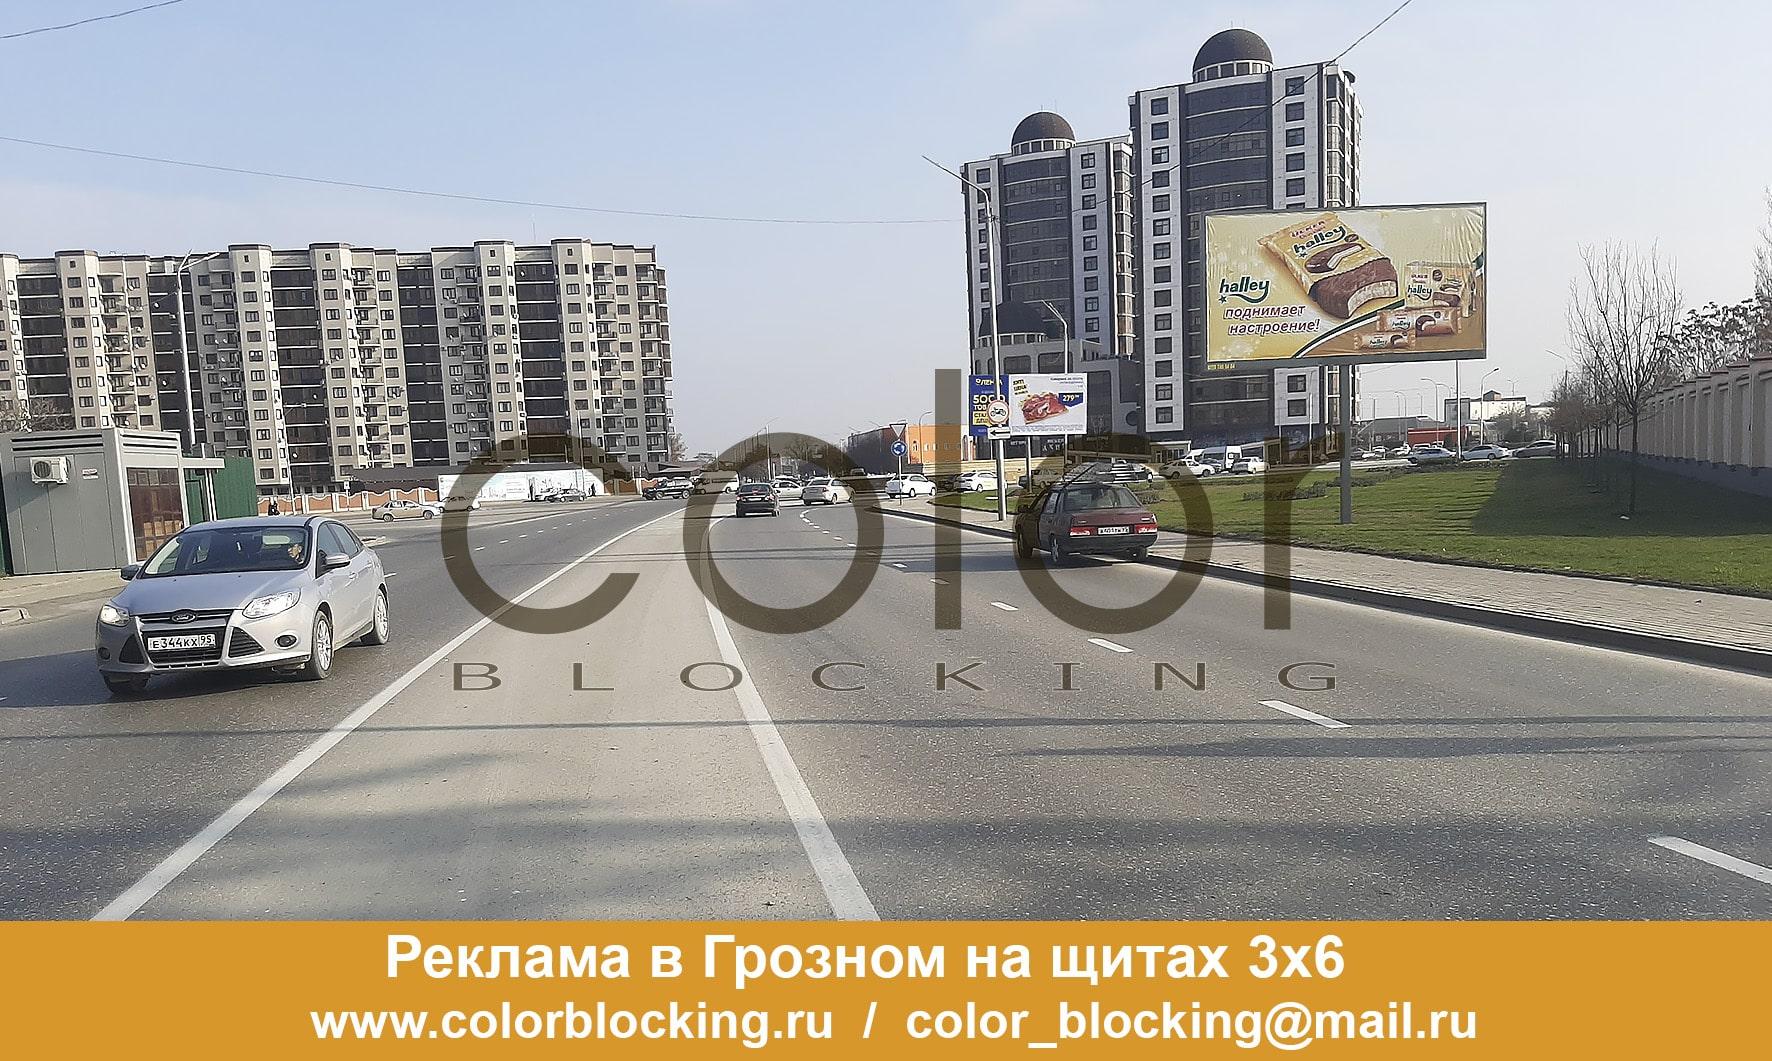 Реклама в Грозном на щитах 3х6 сайханова